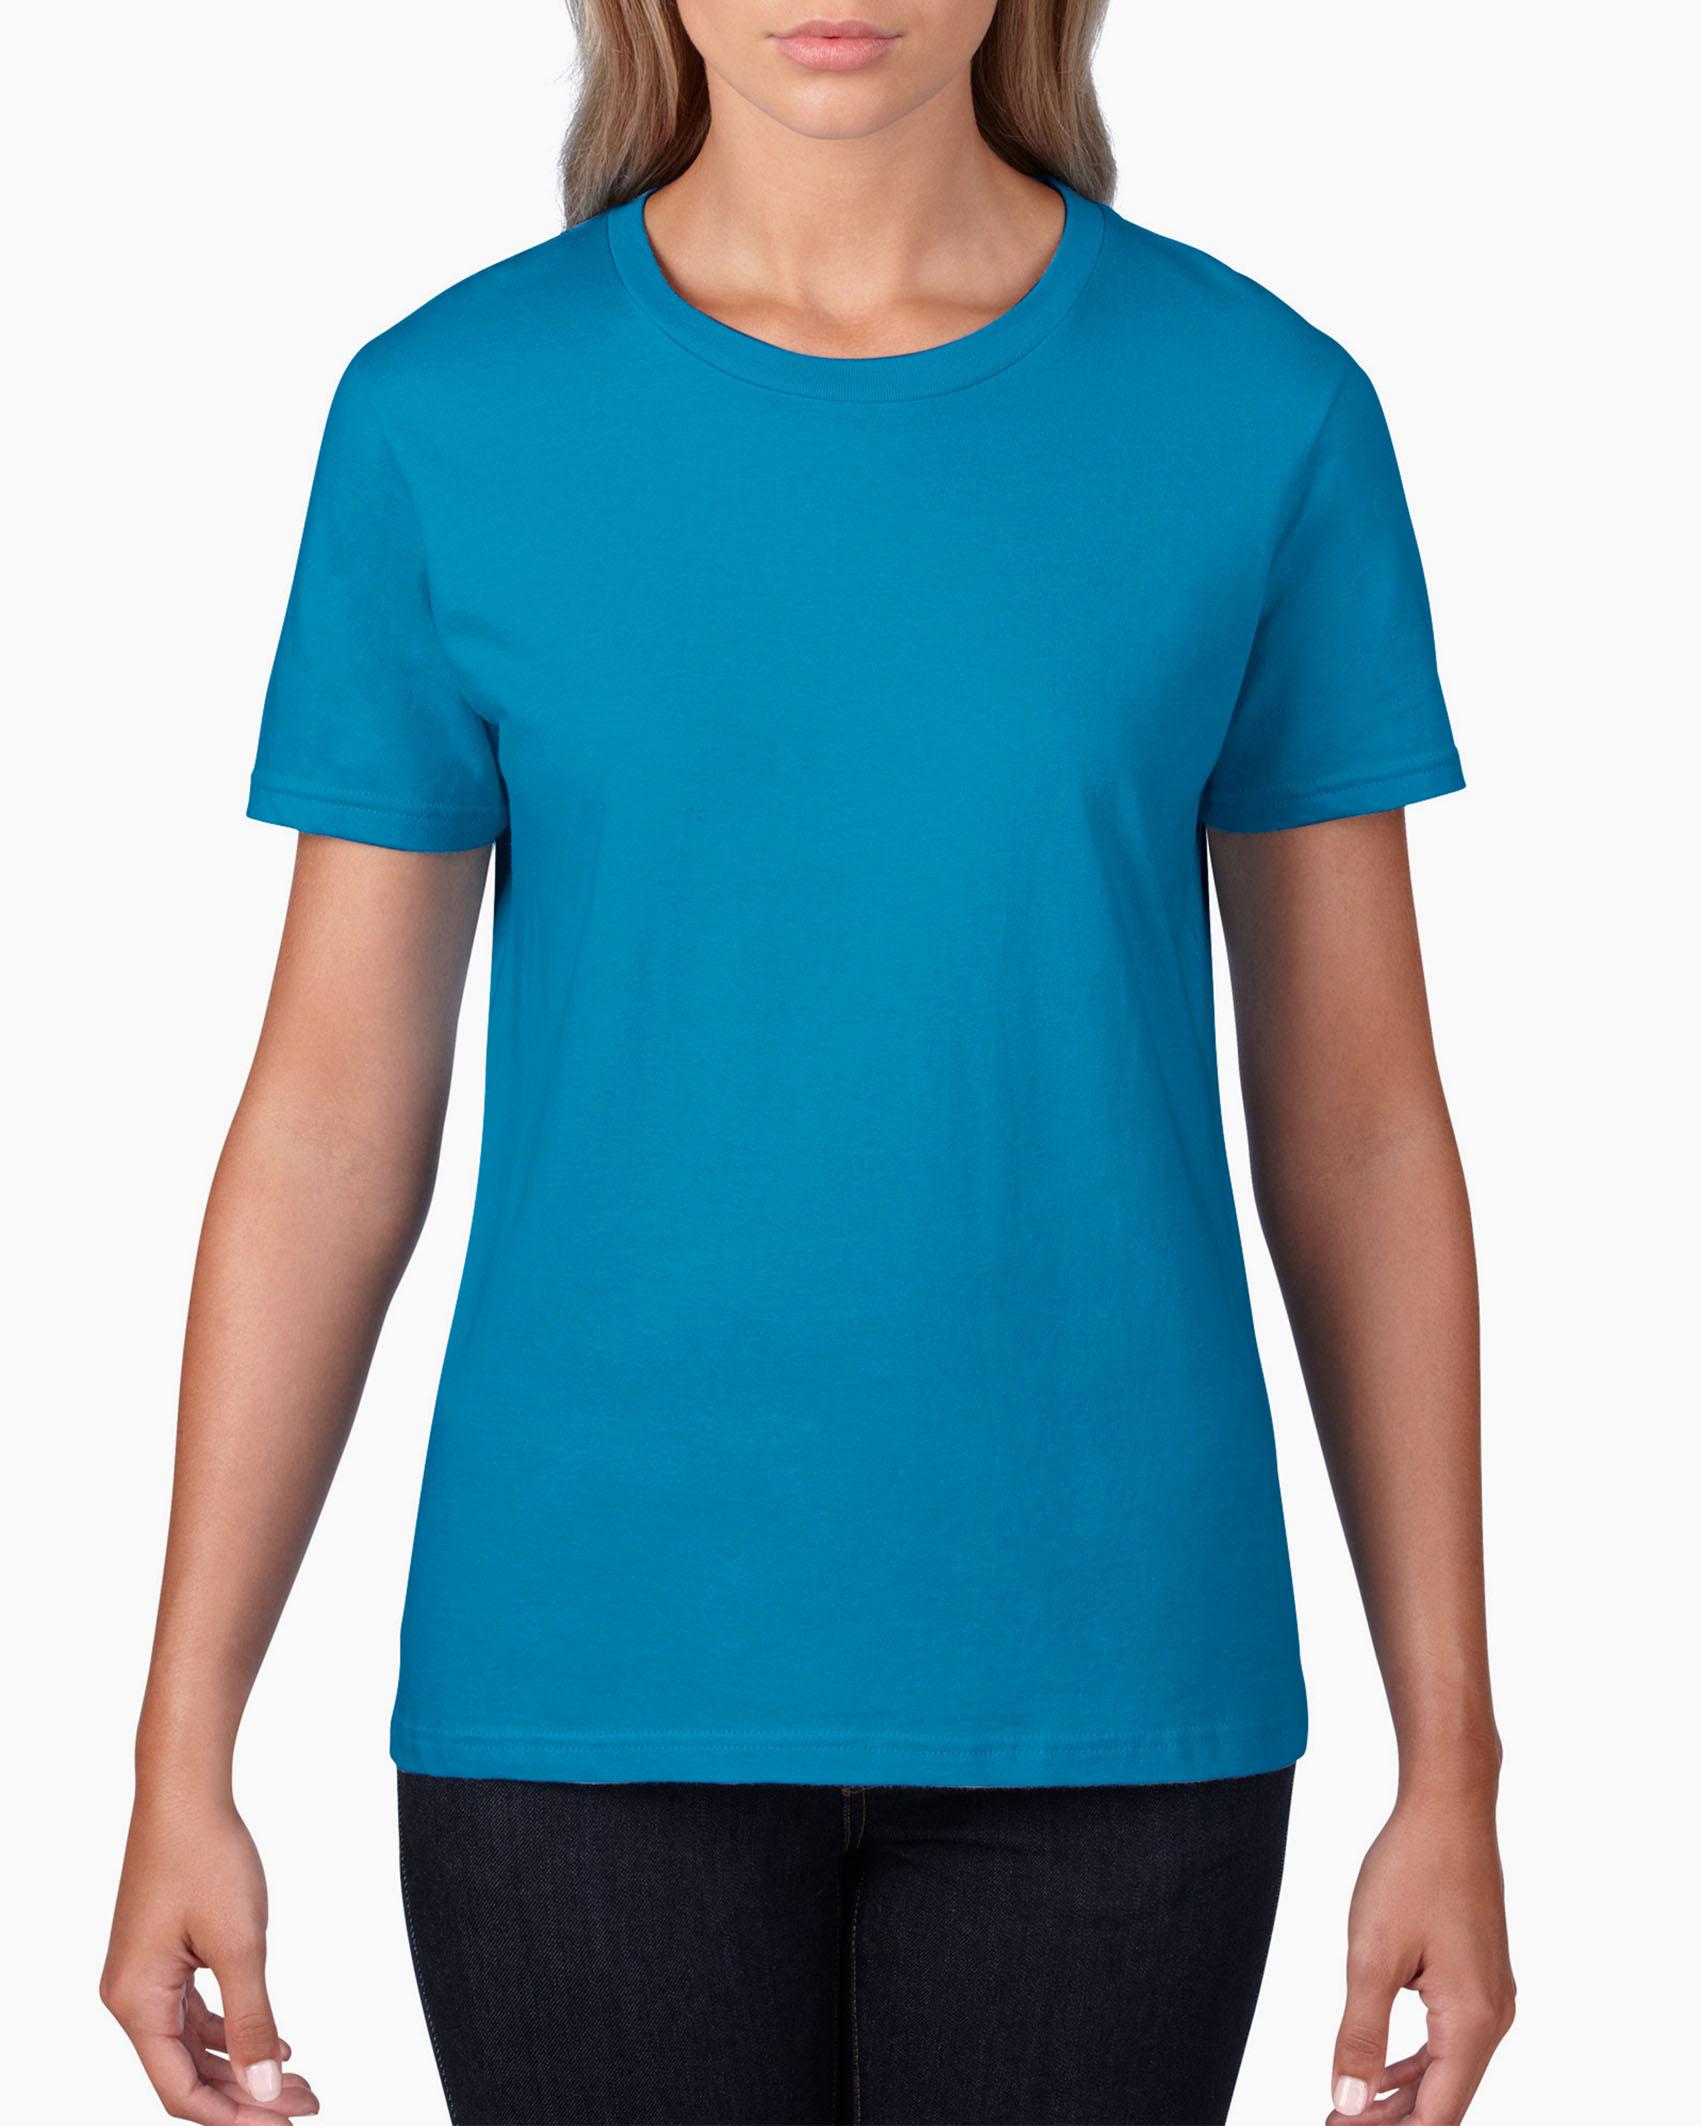 8b19d9cf240 ᐅ T-shirts bedrukken of borduren? Al vanaf €1,95 - T-Shirts.nl